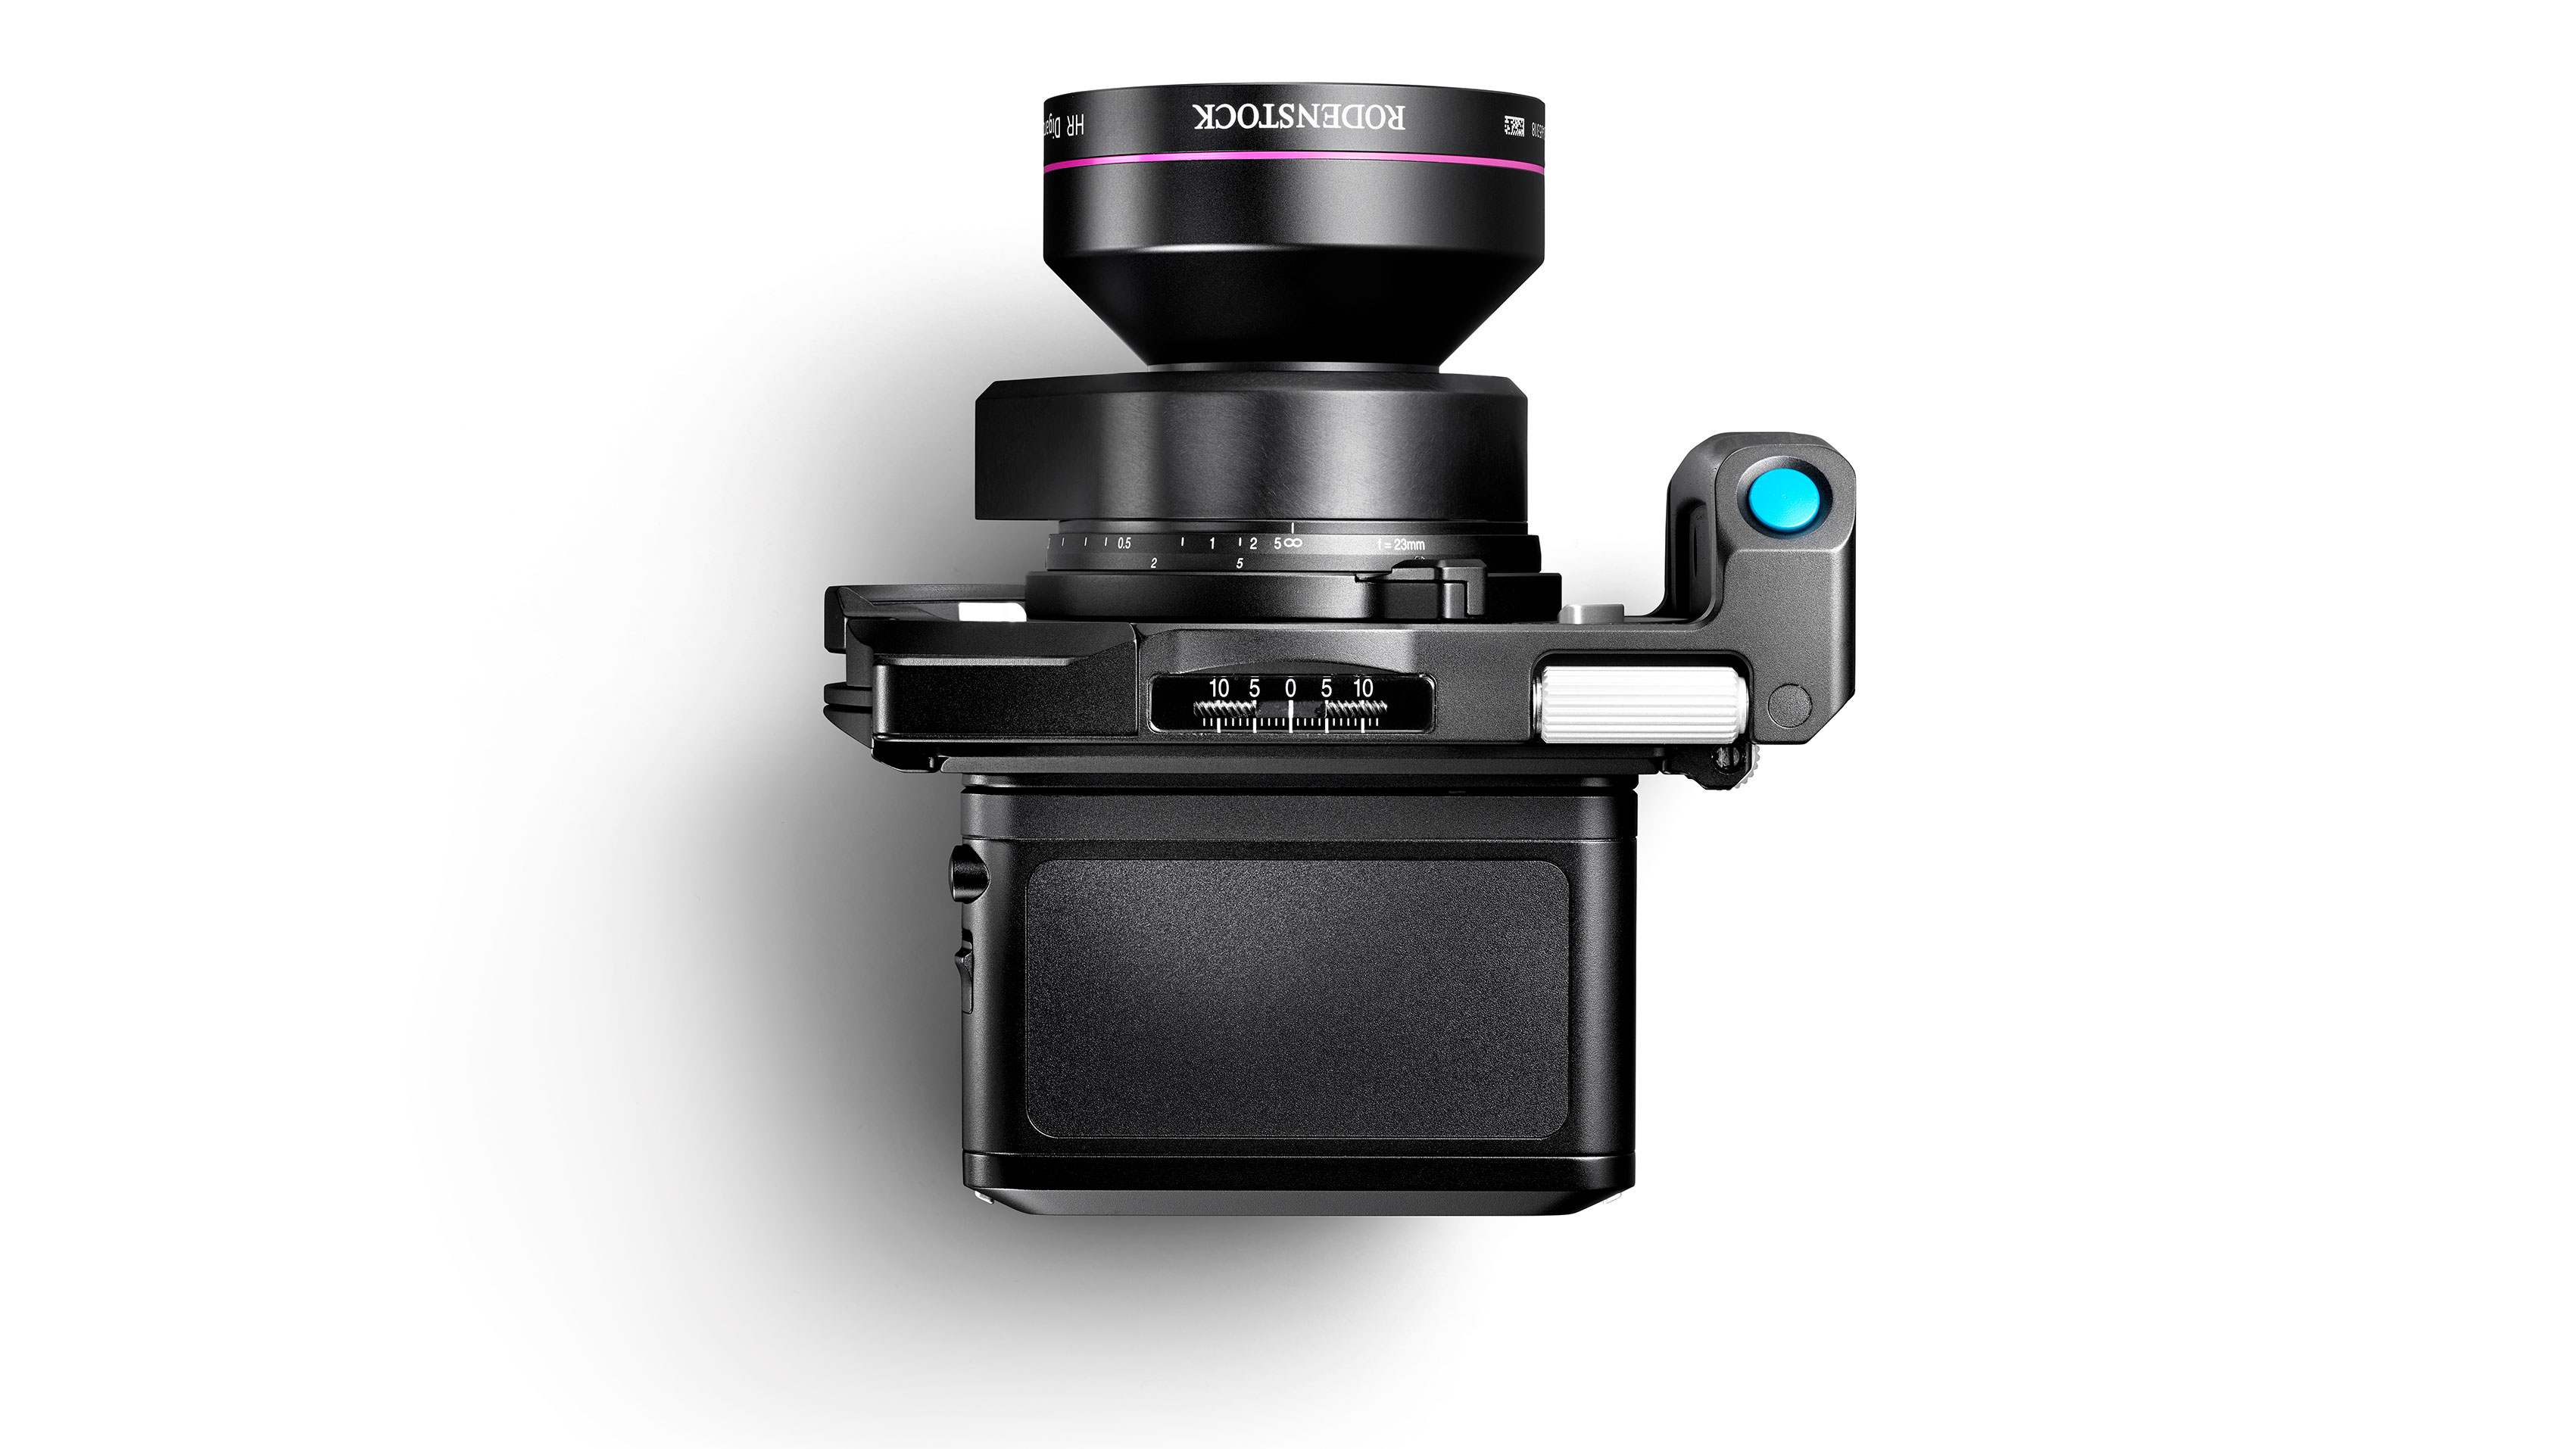 Cameras & Photography - cover